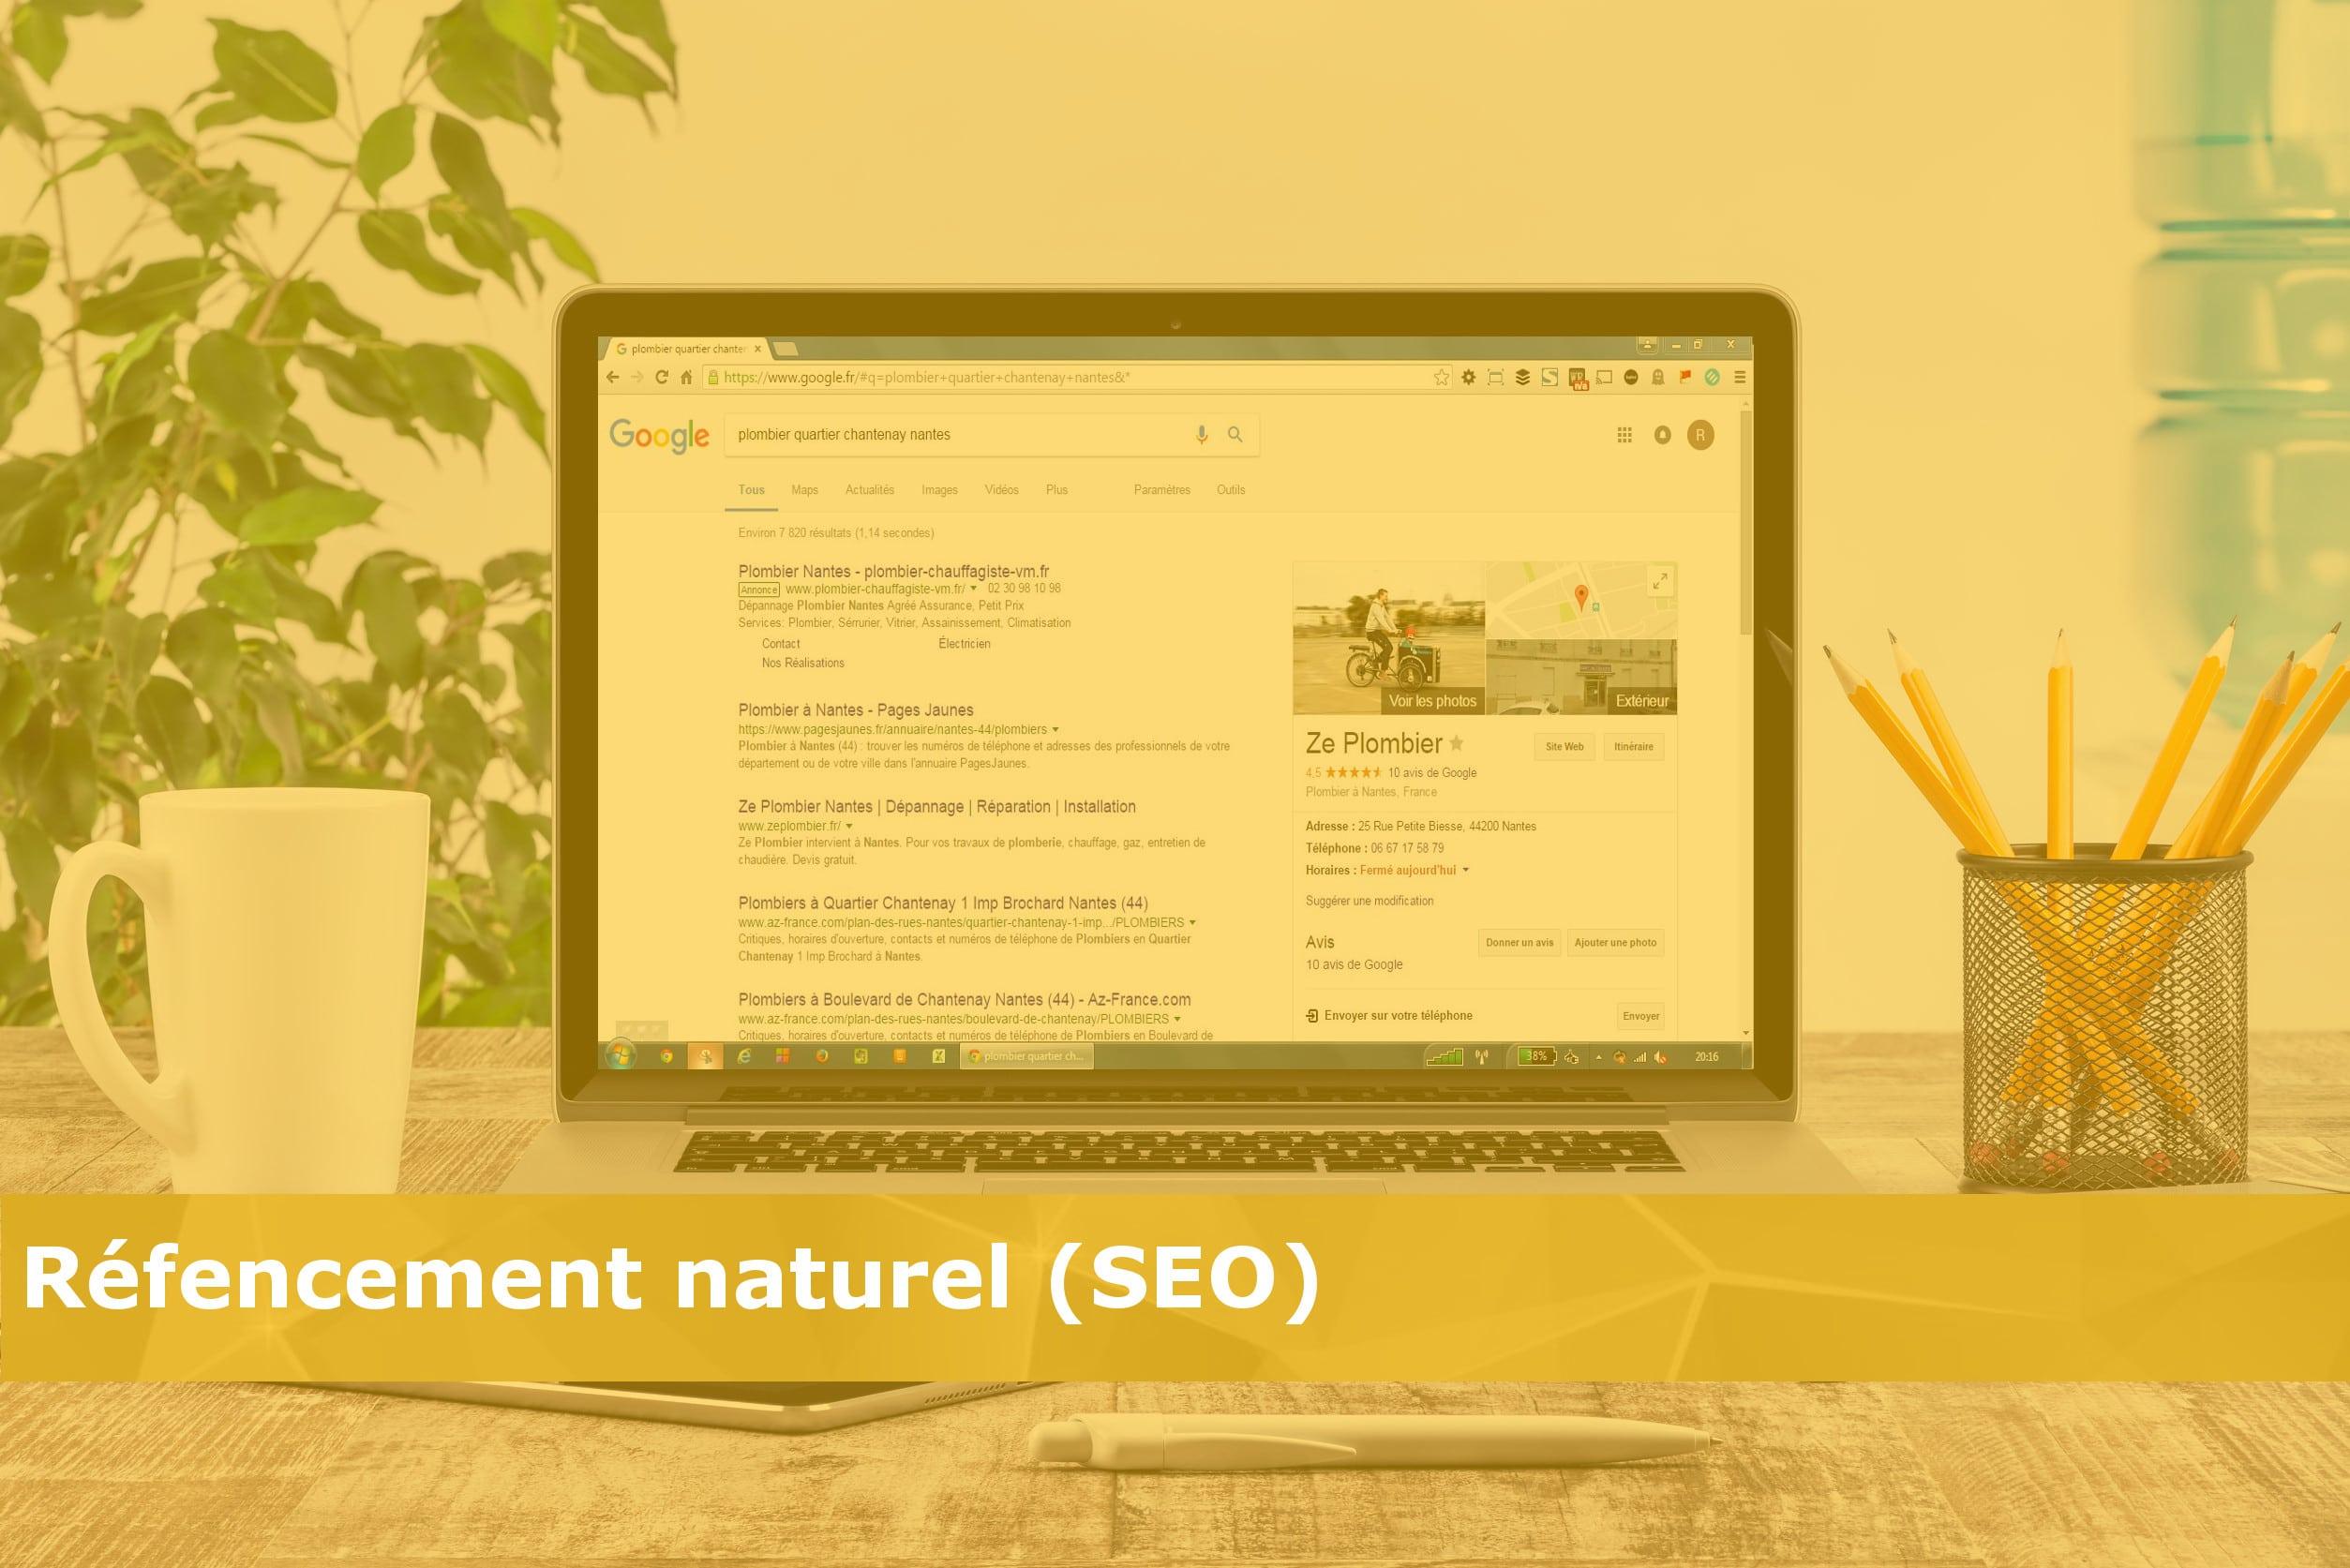 referencement-naturel-seo-cta-yellow